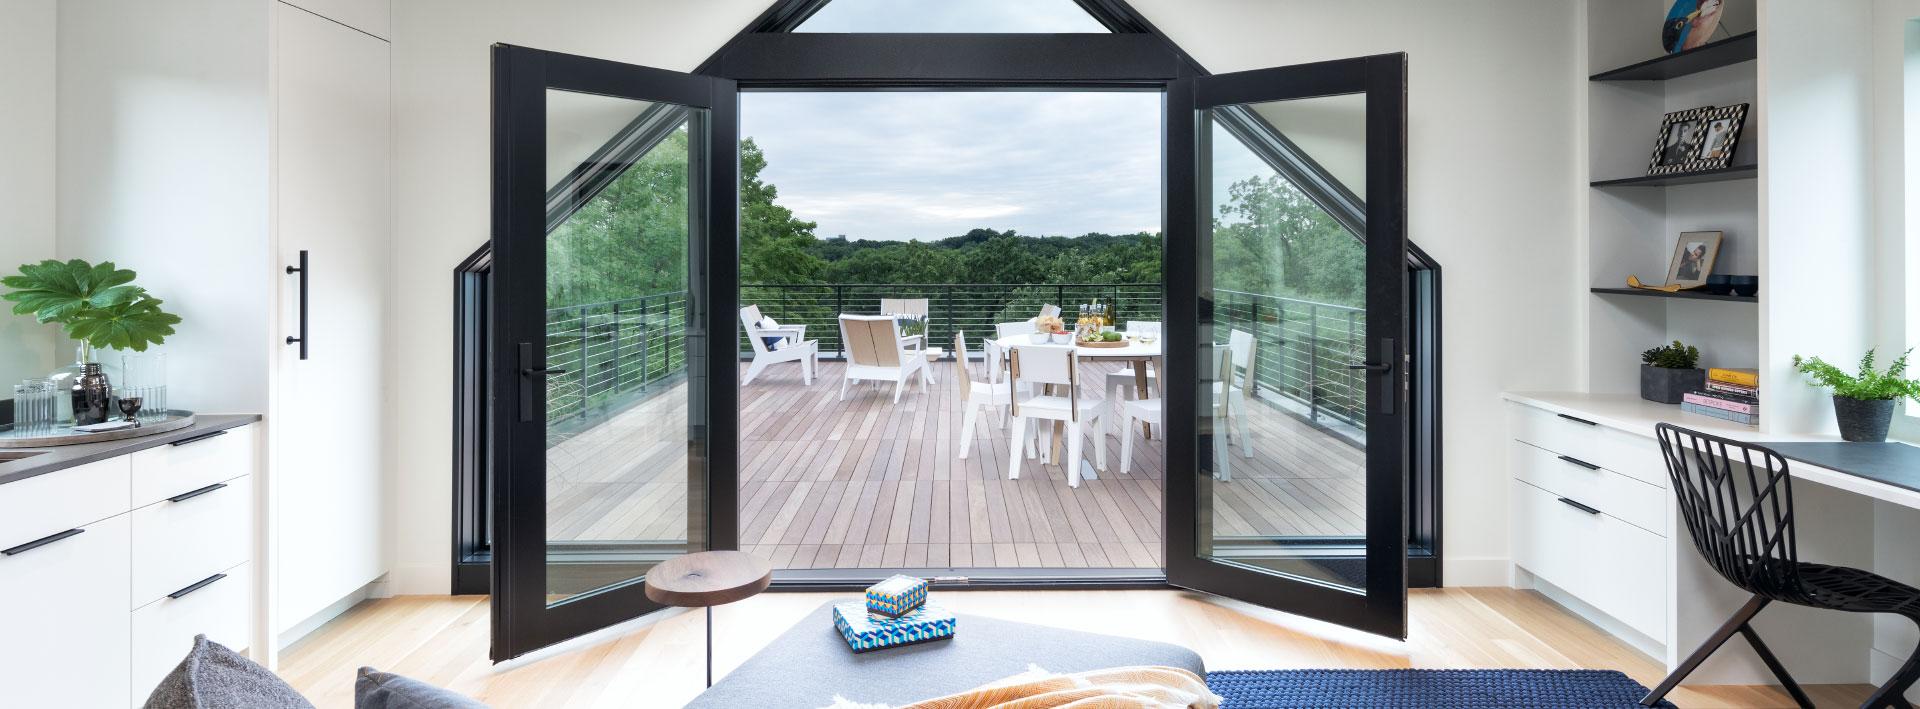 pella architect series wood patio